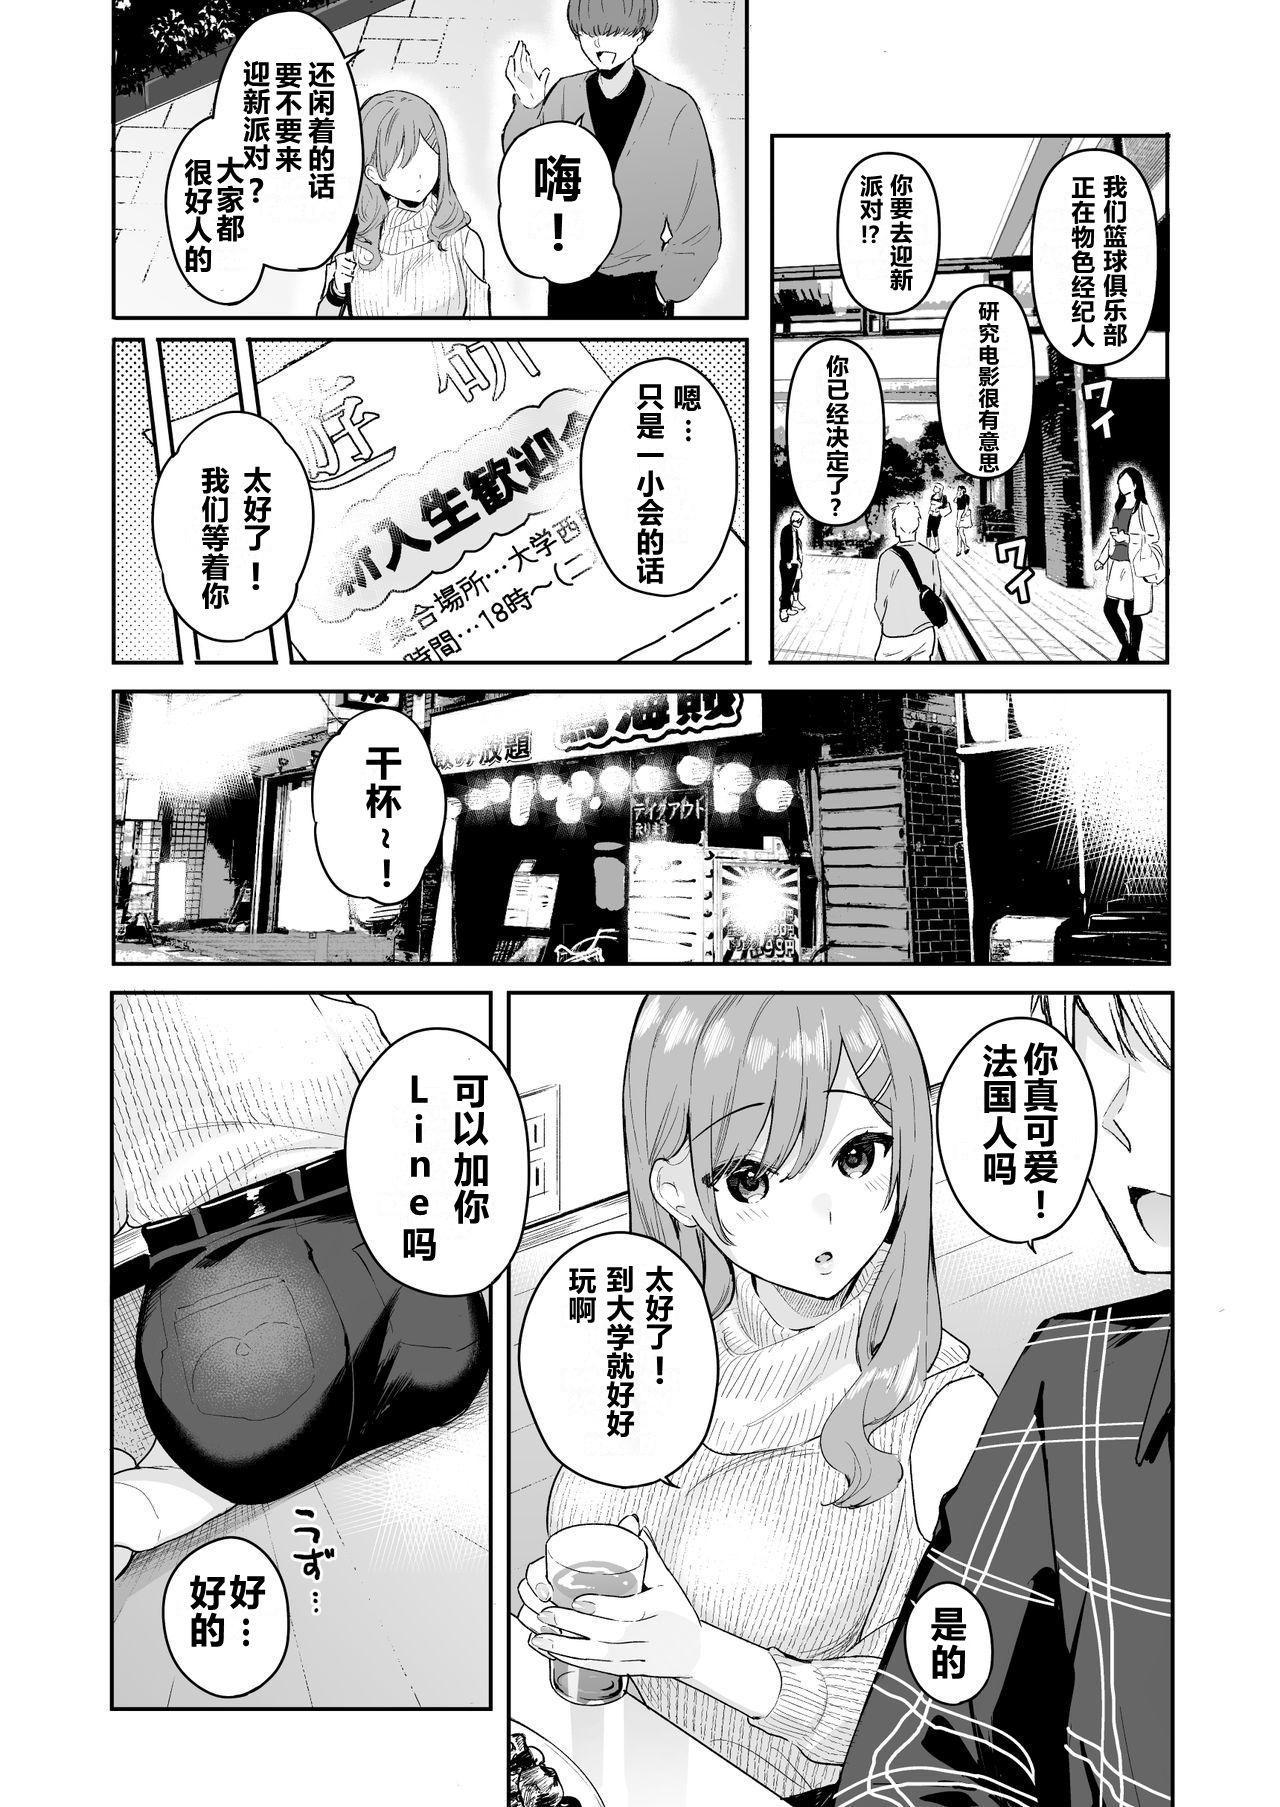 Itomusubi Vol. 4 41